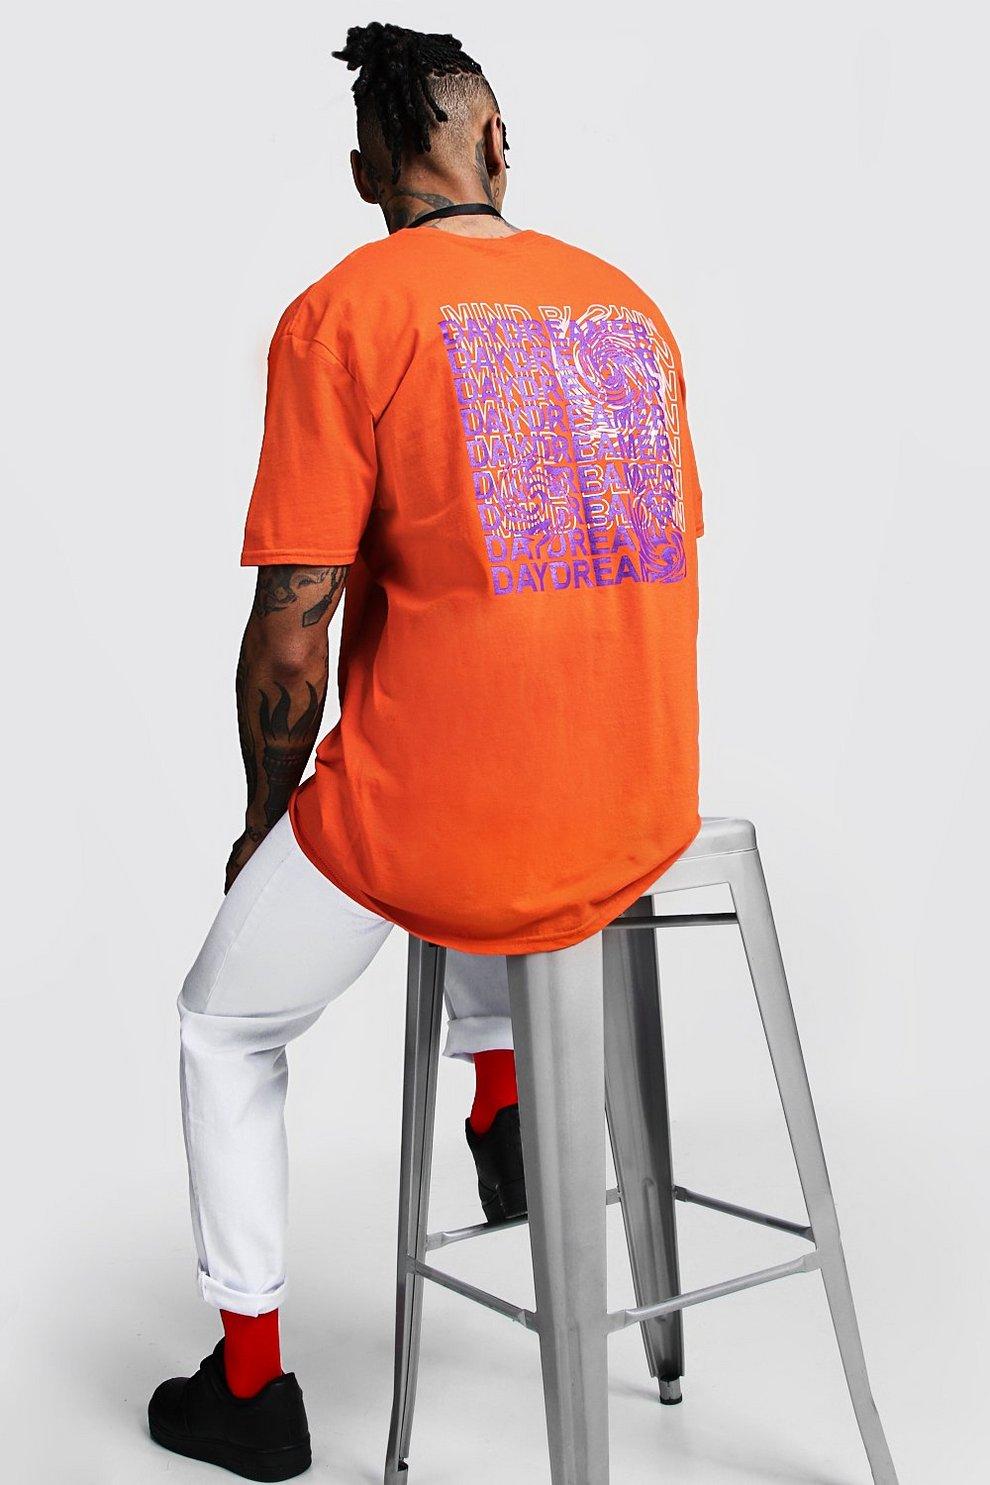 La Ancha En Camiseta De Con Manga Corta Estampado Espalda 4jARc5L3q